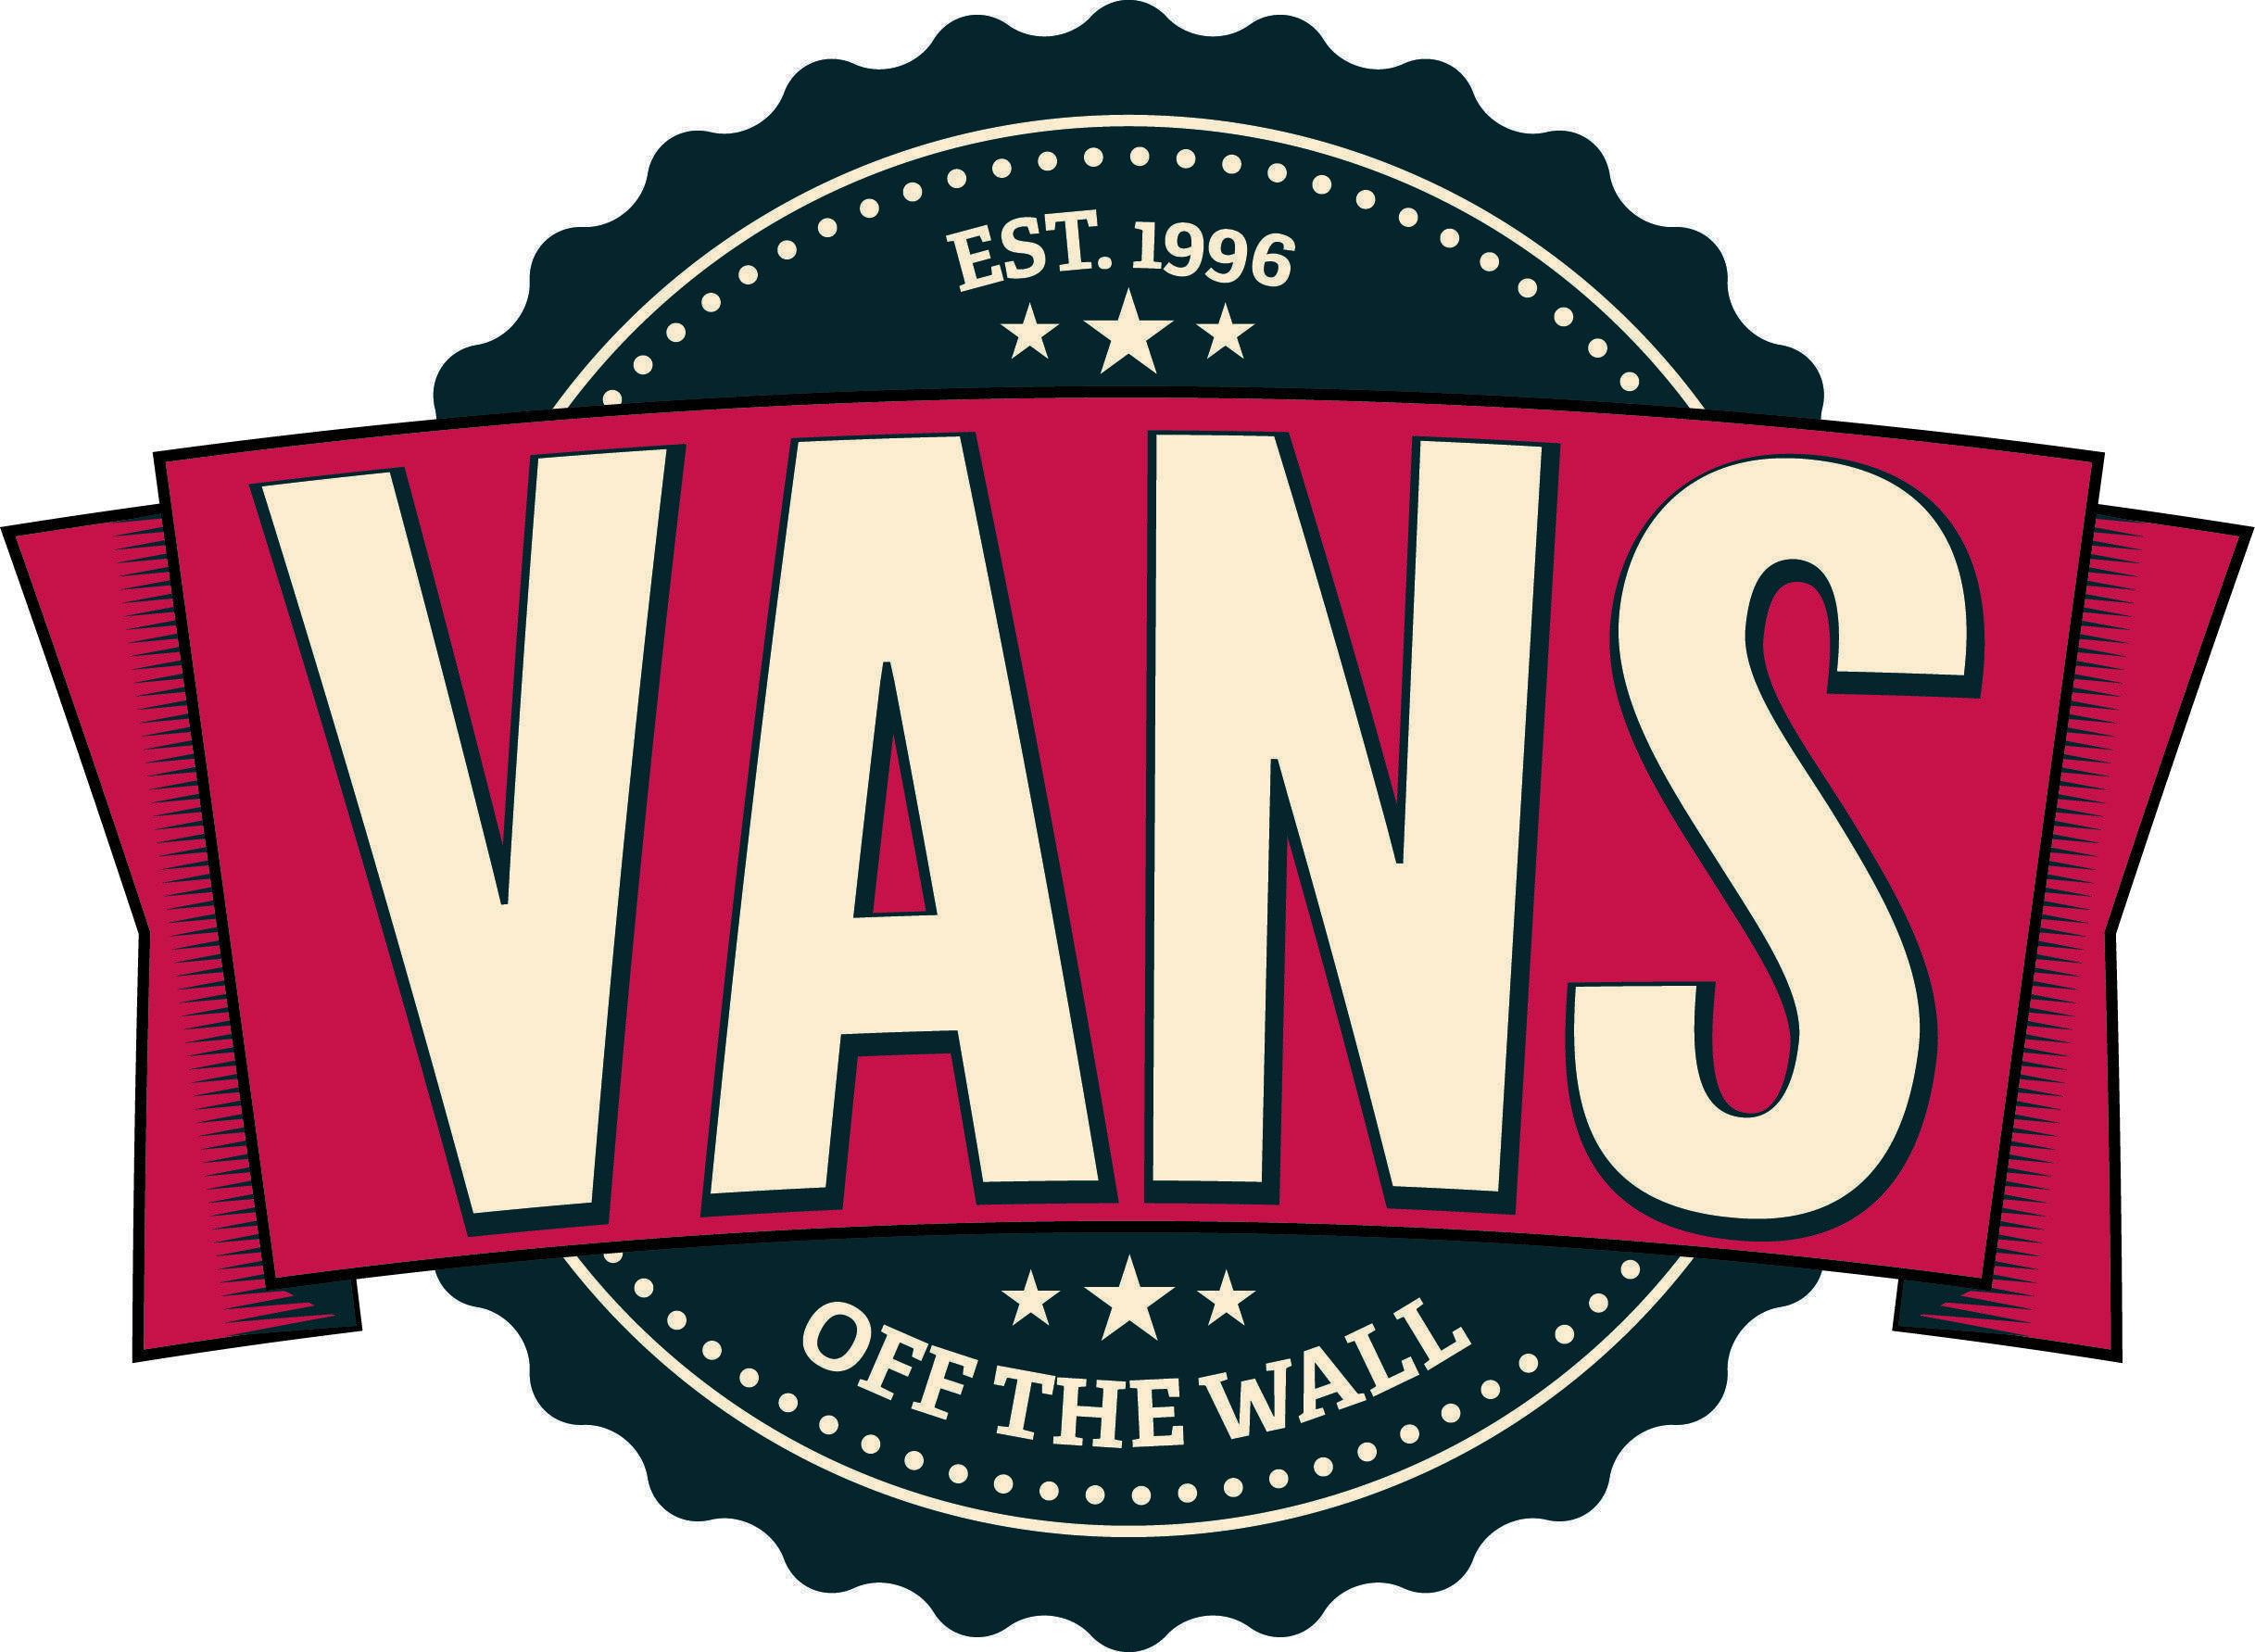 Vans Wallpaper Iphone 7 Plus Many Hd Wallpaper